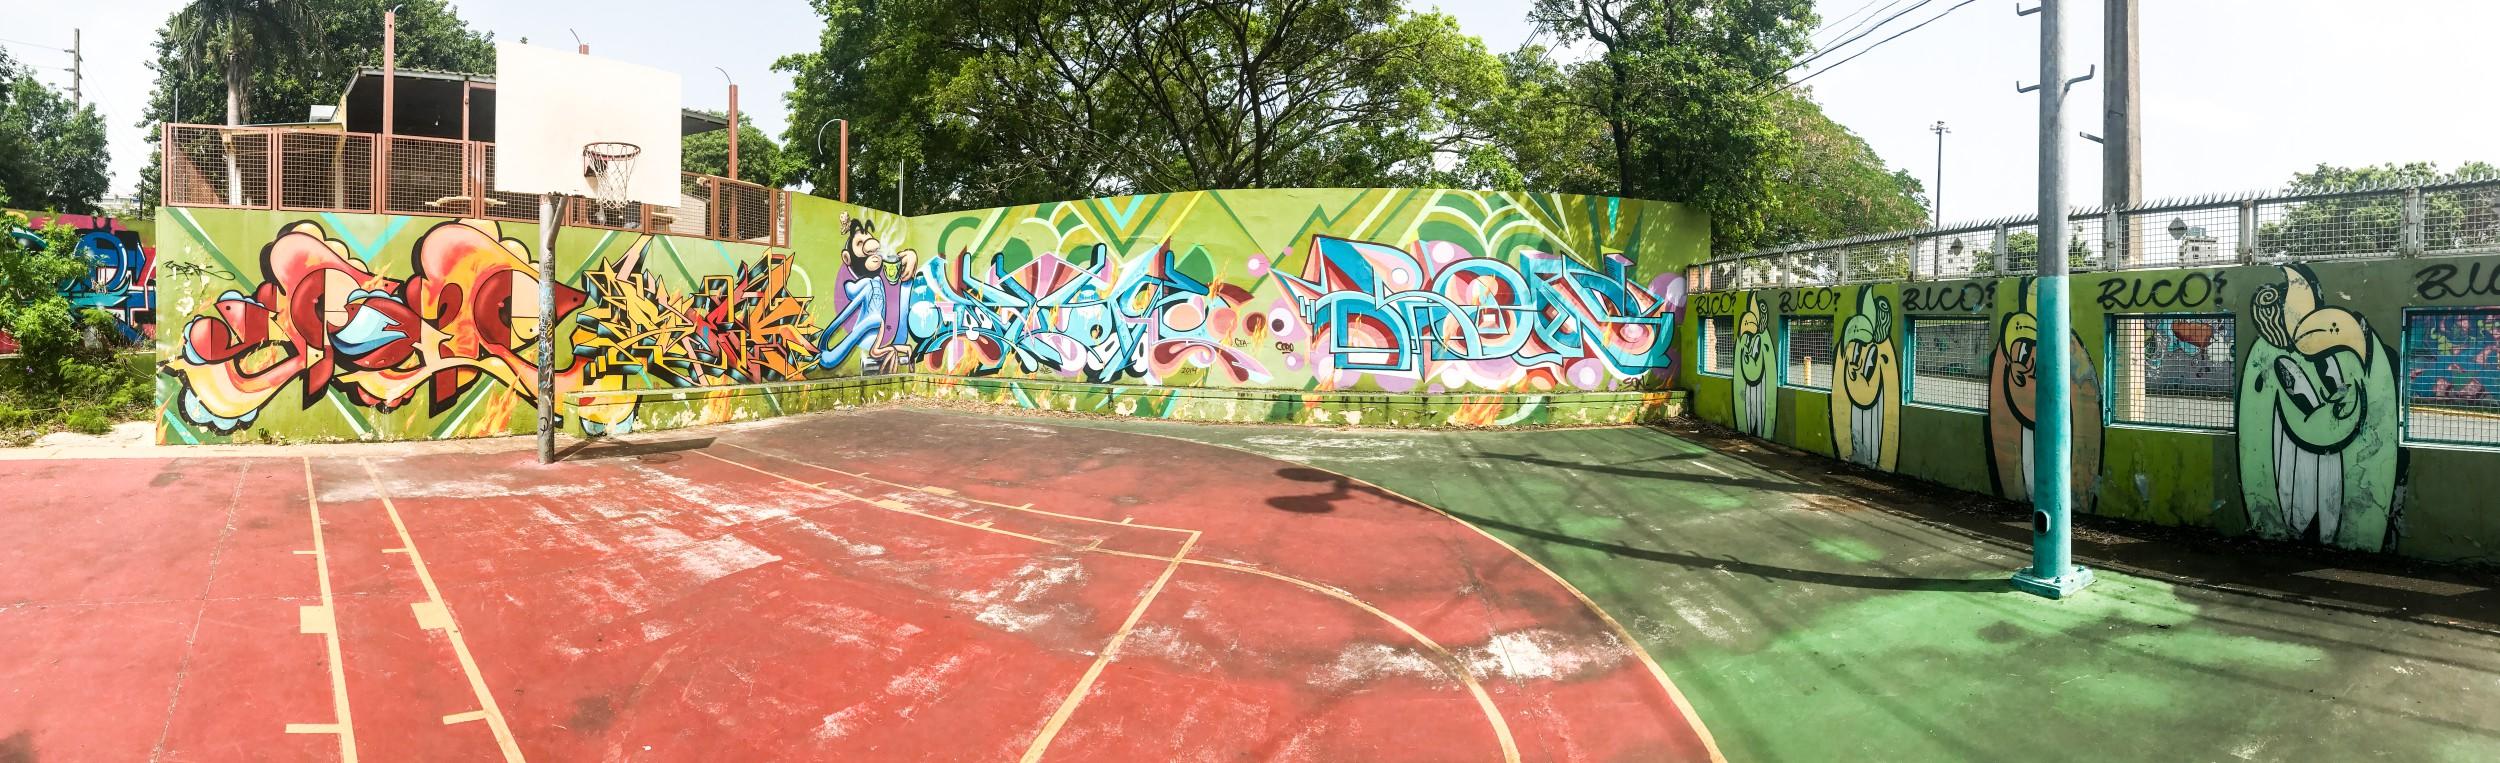 Basket Ball Court Graffiti San Juan